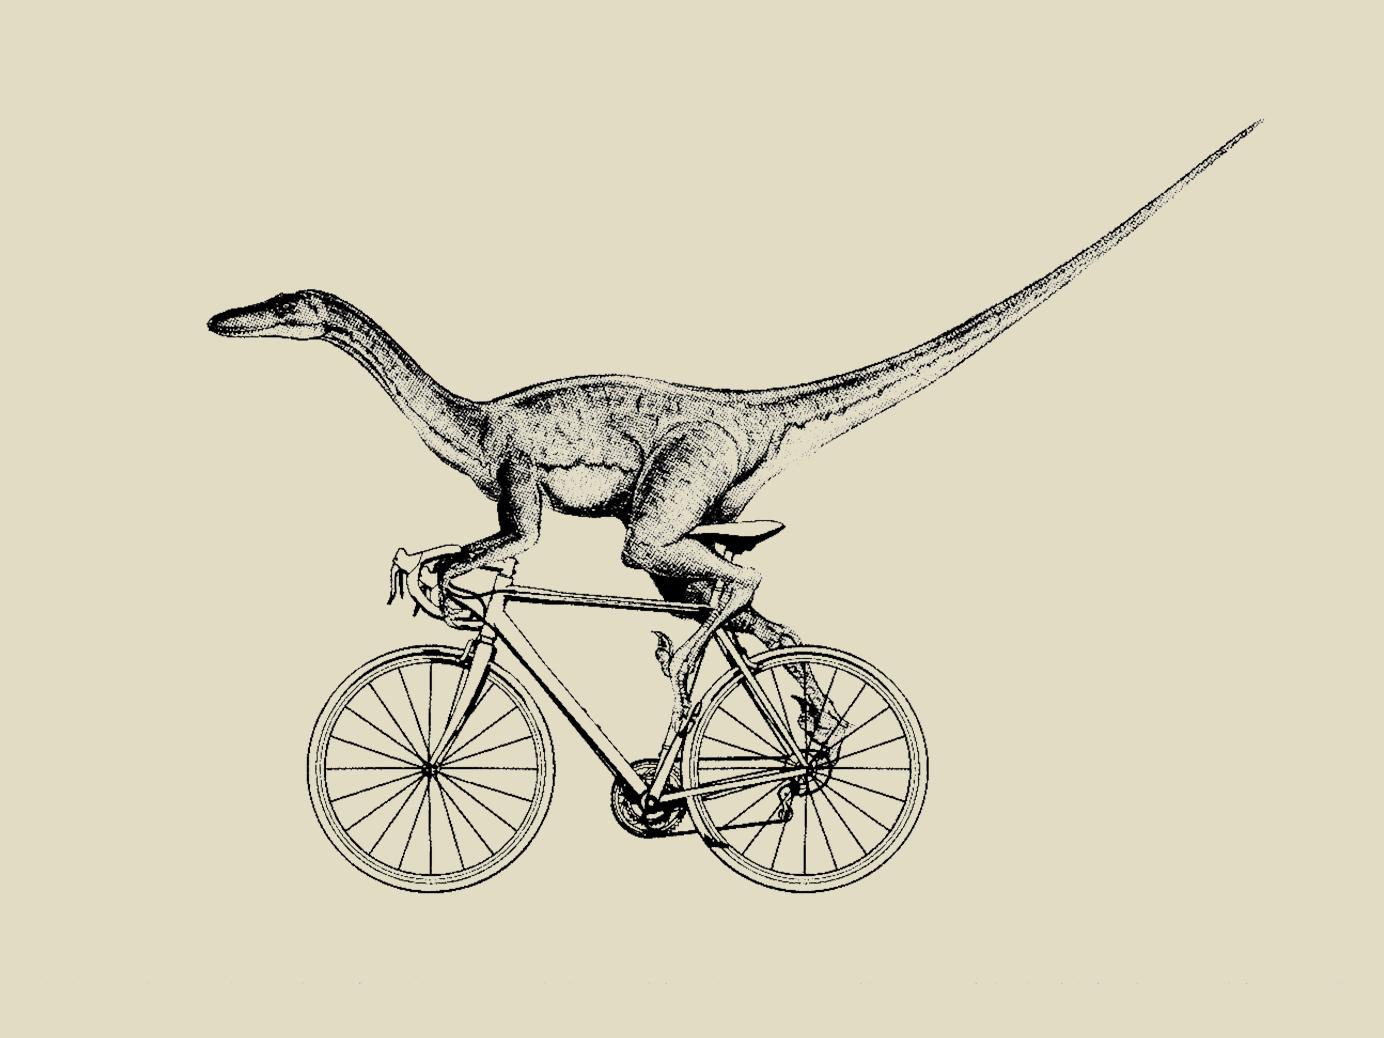 Velociraptor Valera dinosaur bycicle valera velociraptor illustration design t-shirt